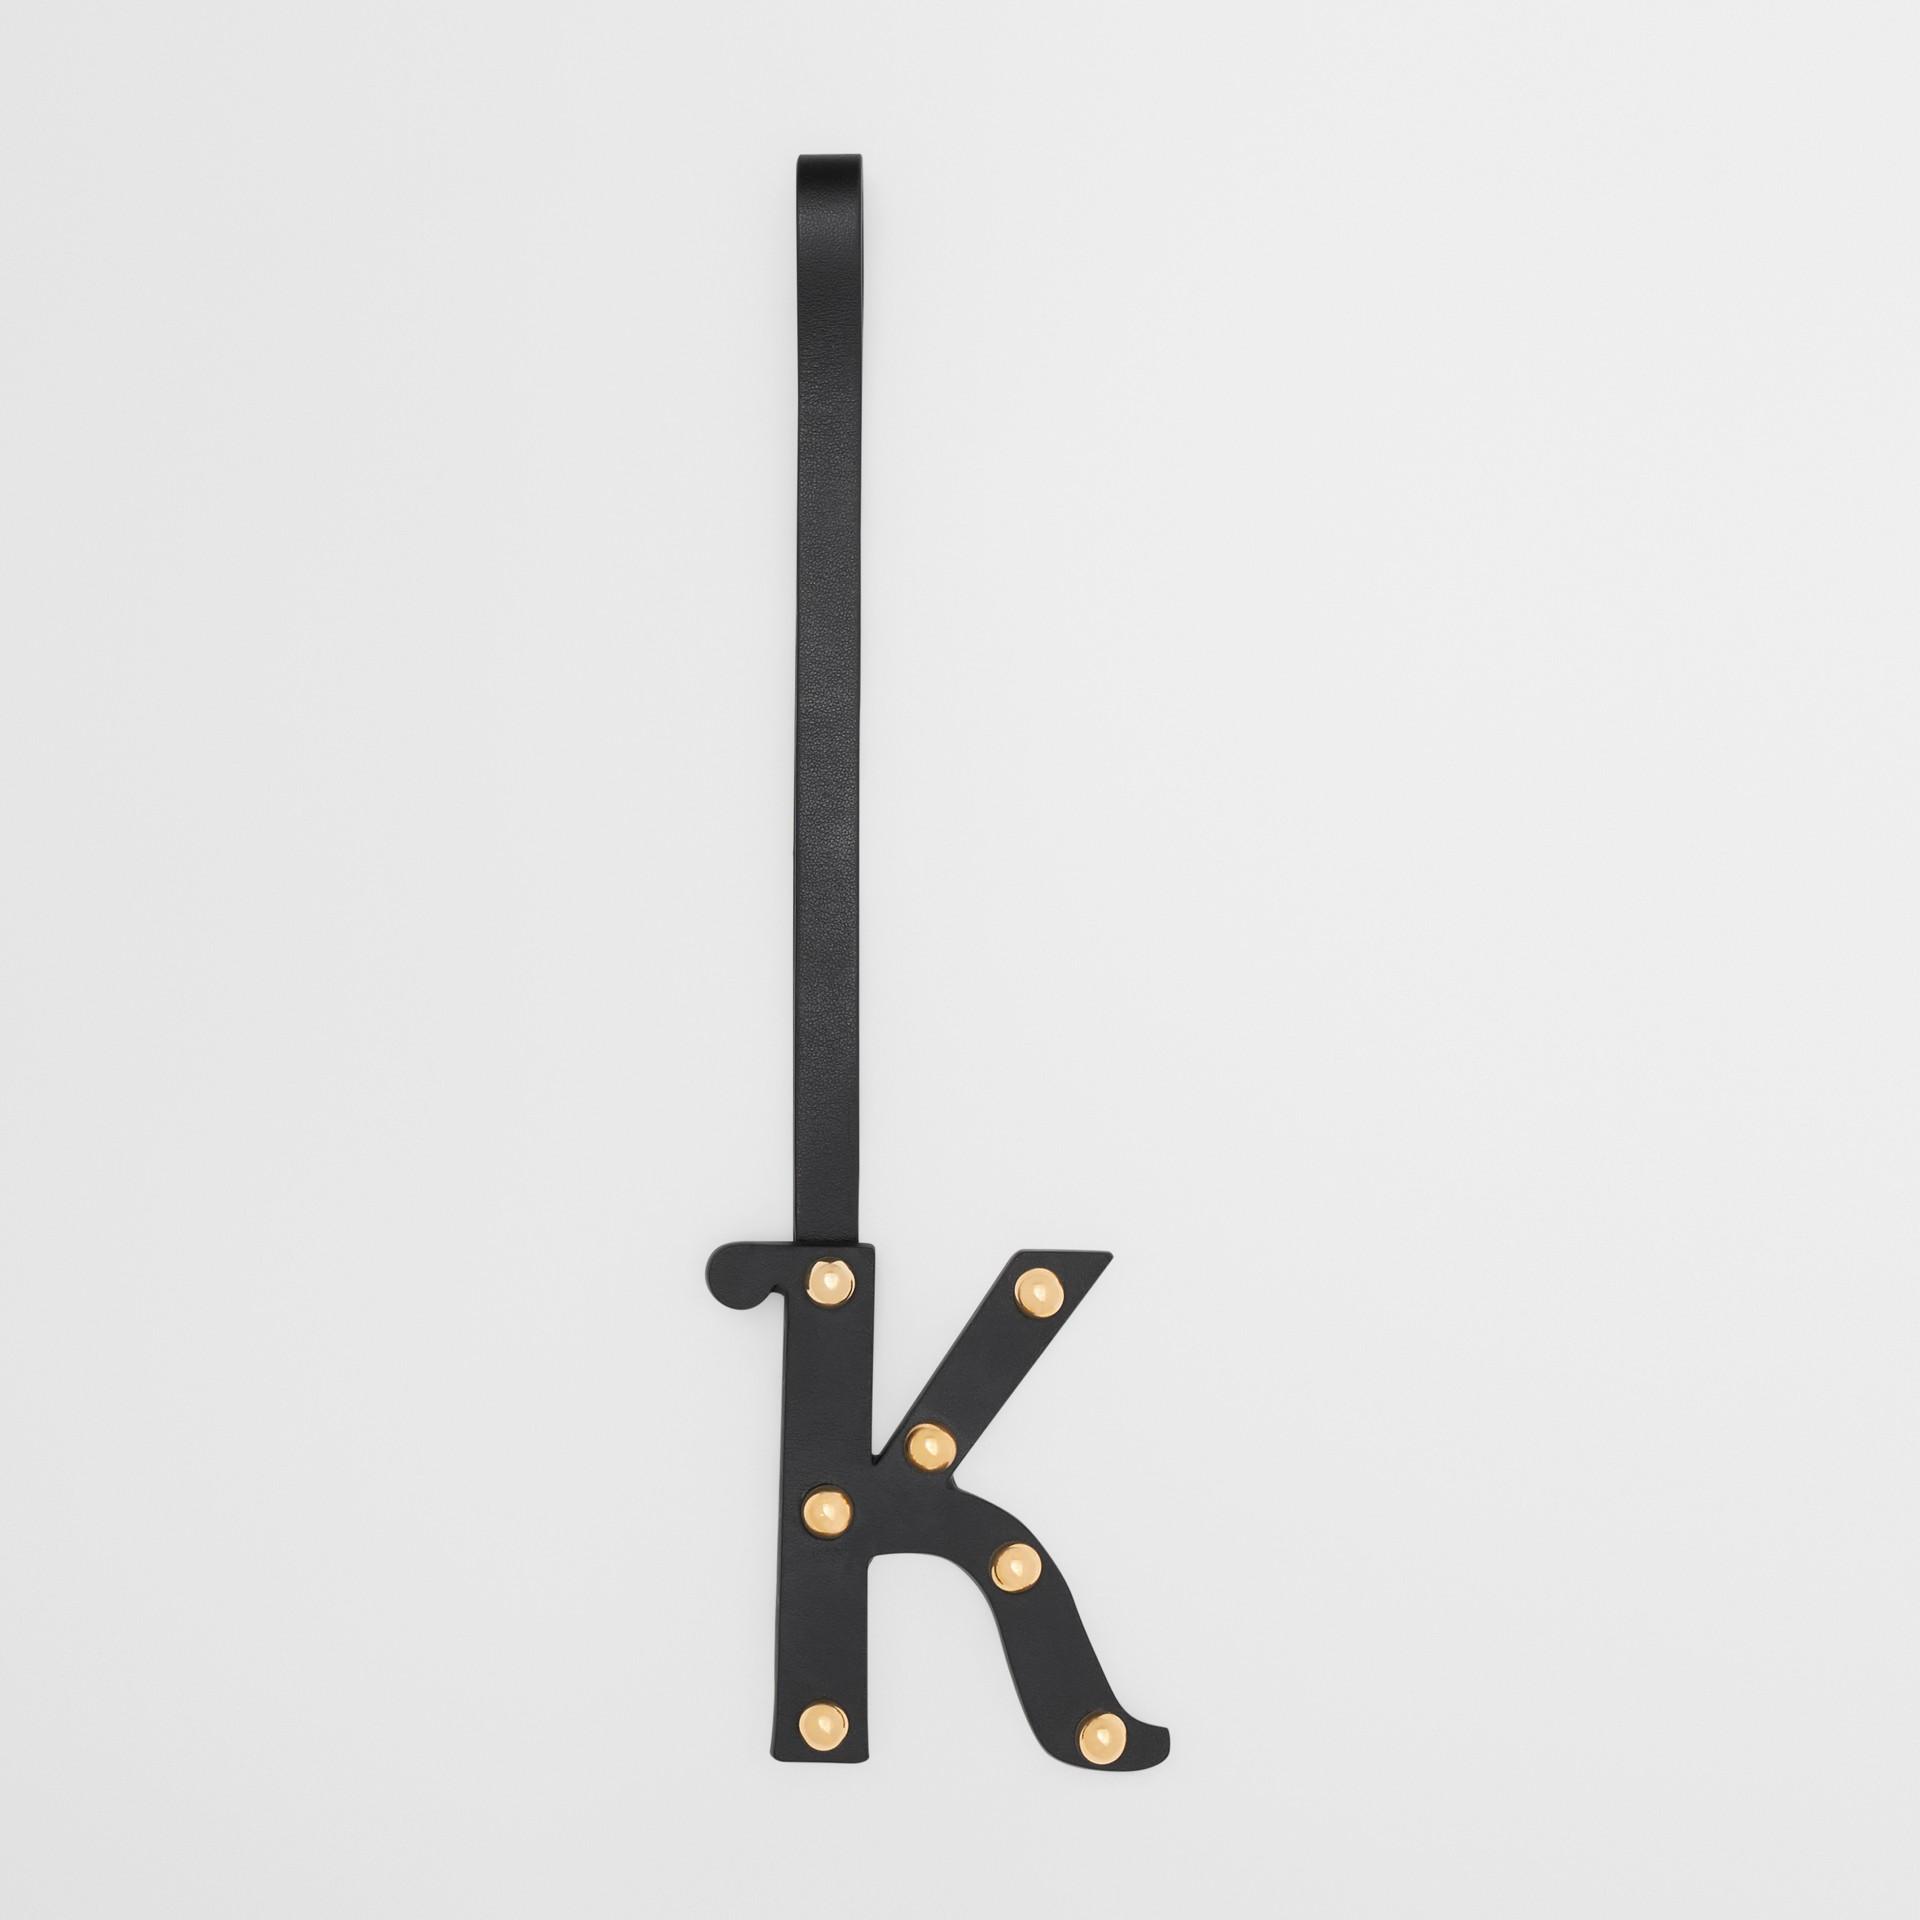 「K」スタッズレザー アルファベットチャーム (ブラック/ライトゴールド) | バーバリー - ギャラリーイメージ 0